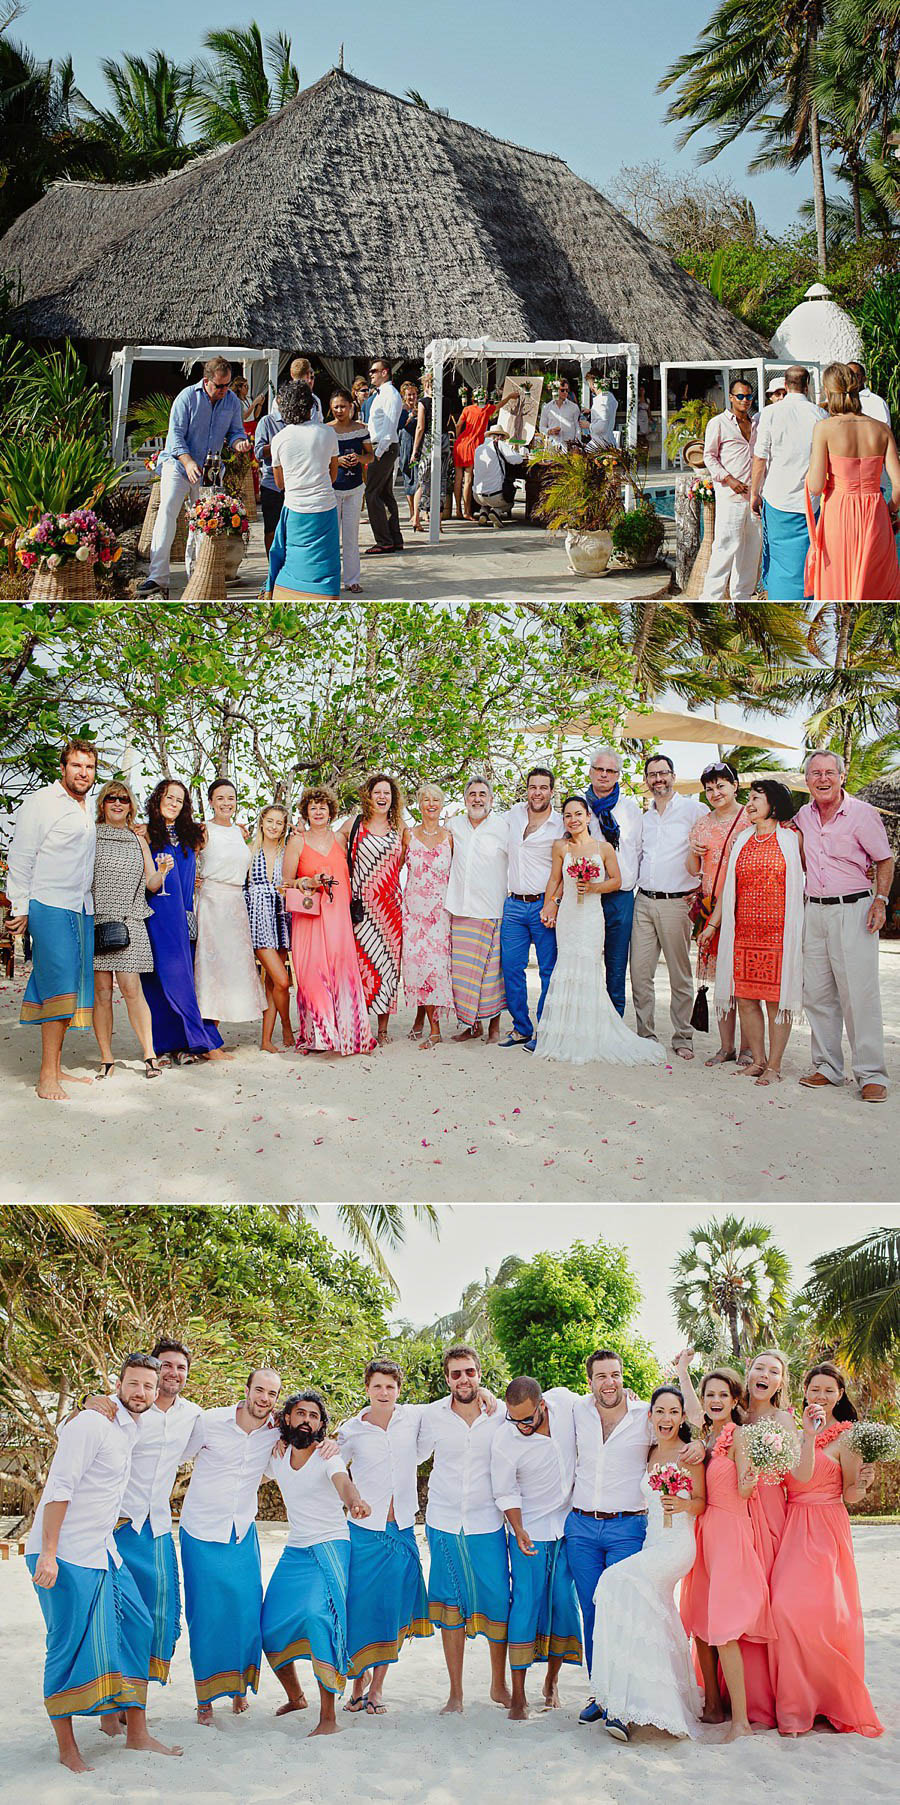 zanzibar_tanzania_kenya_malindi_beach_multicultural_wedding_photography_mamalovebabamarry_0018.jpg